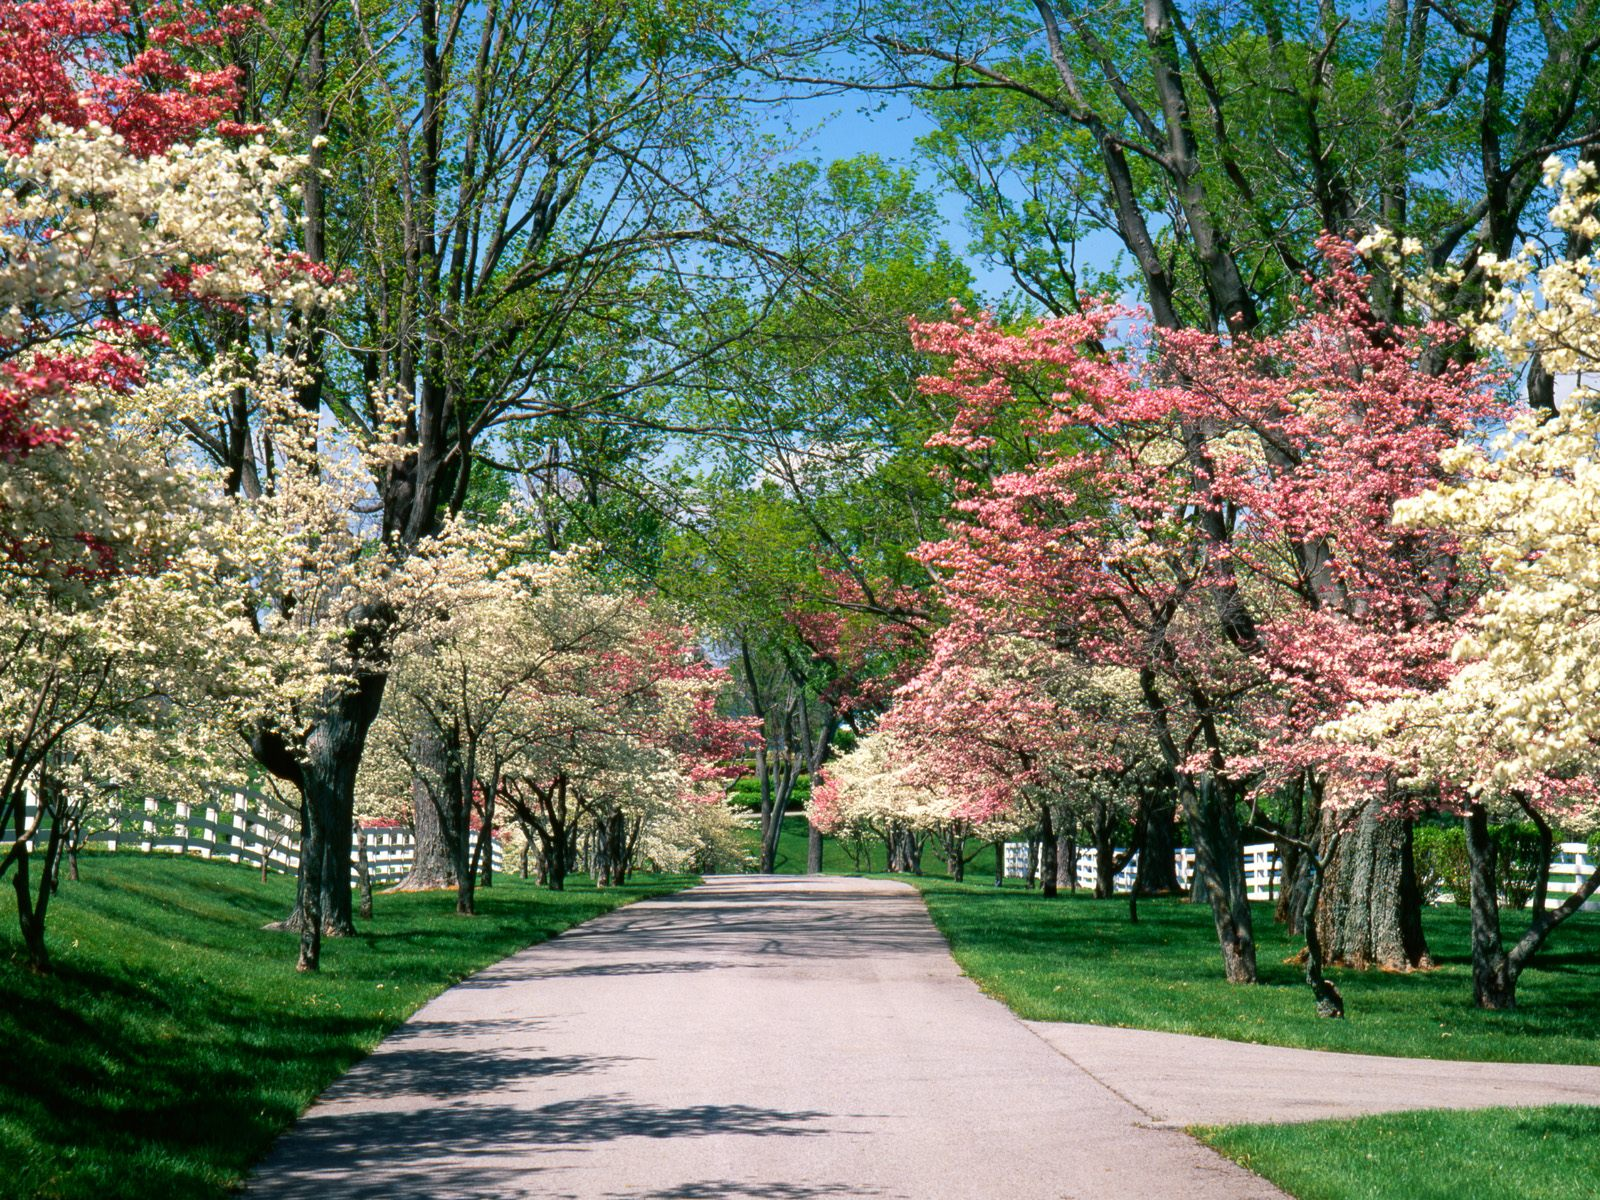 http://3.bp.blogspot.com/-WHxleRFNBCU/TaJxD89-knI/AAAAAAAAANM/66FFUbL6q9c/s1600/Pink_and_White_Dogwood_Trees_Lexington_Kentucky.jpg